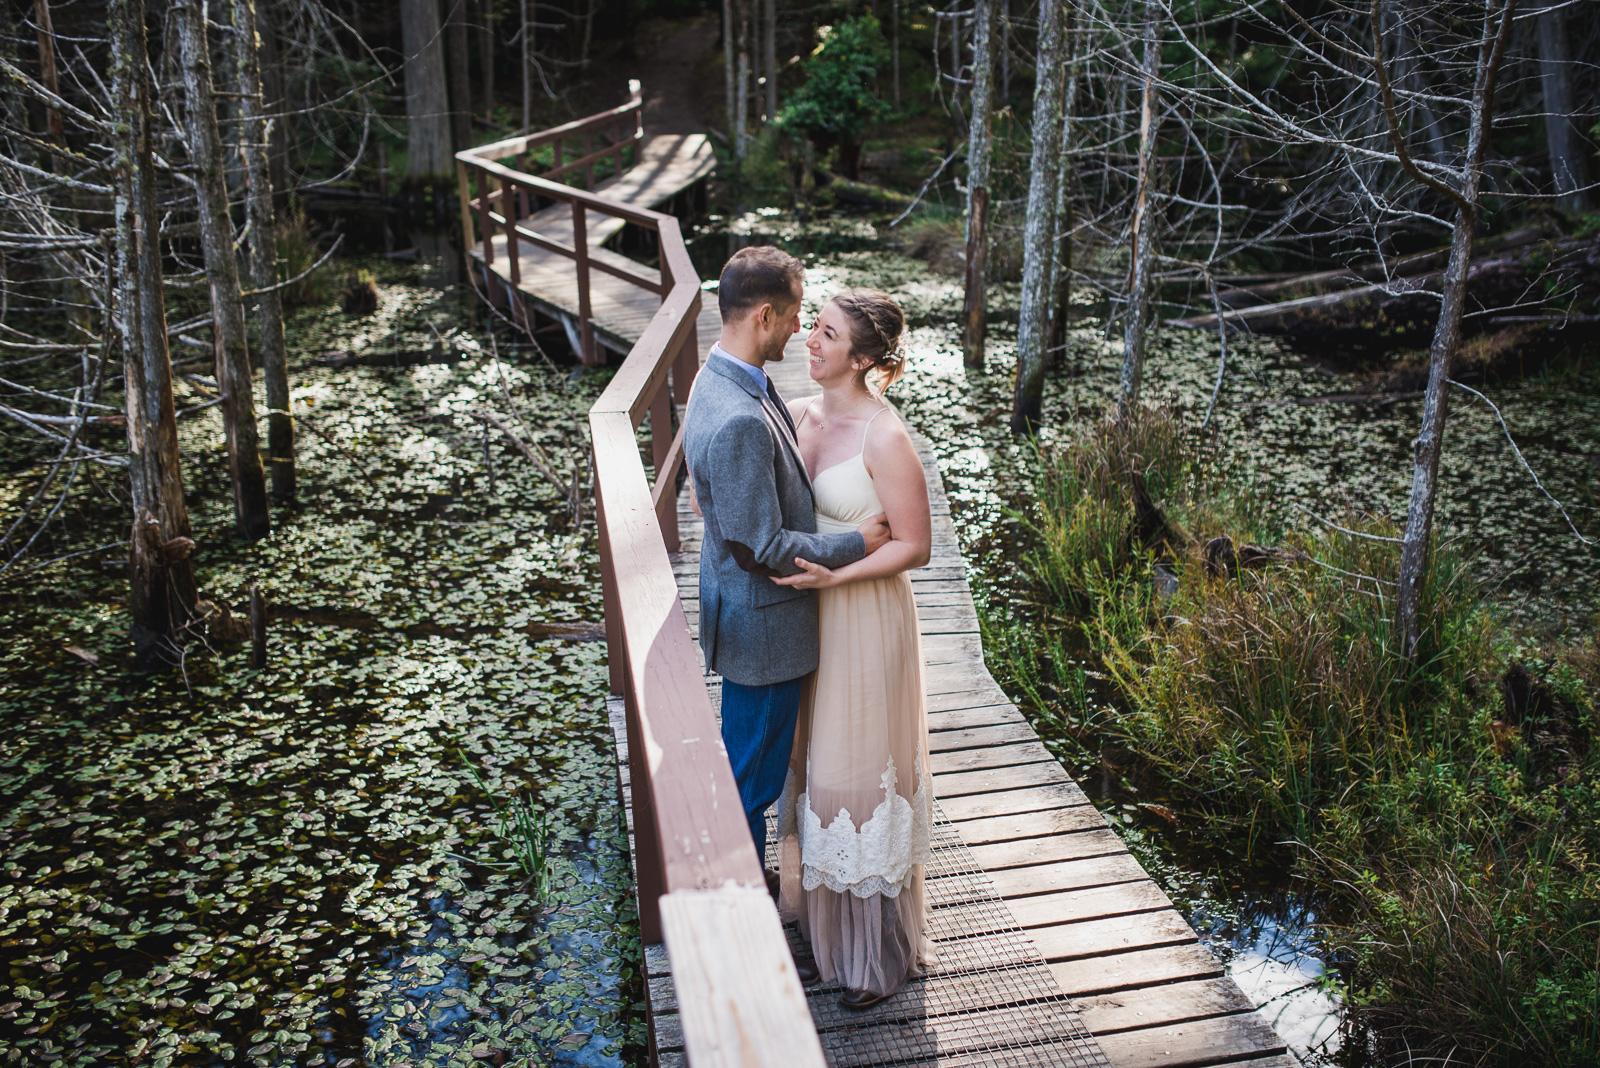 vancouver-island-wedding-photographers-cliff-gilker-park-smugglers-cove-elopement-27.jpg